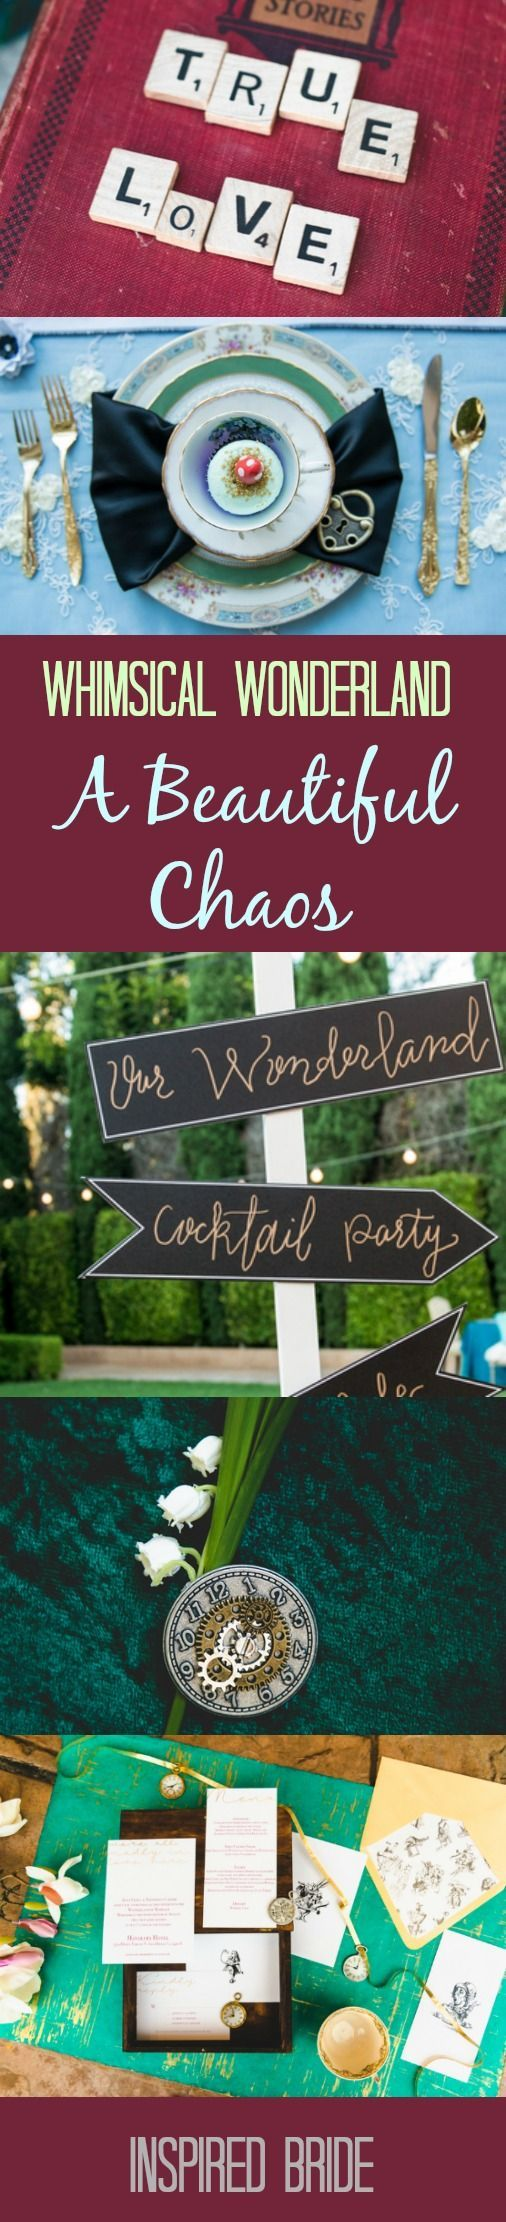 2902 best Wedding Ideas images on Pinterest Wedding trends